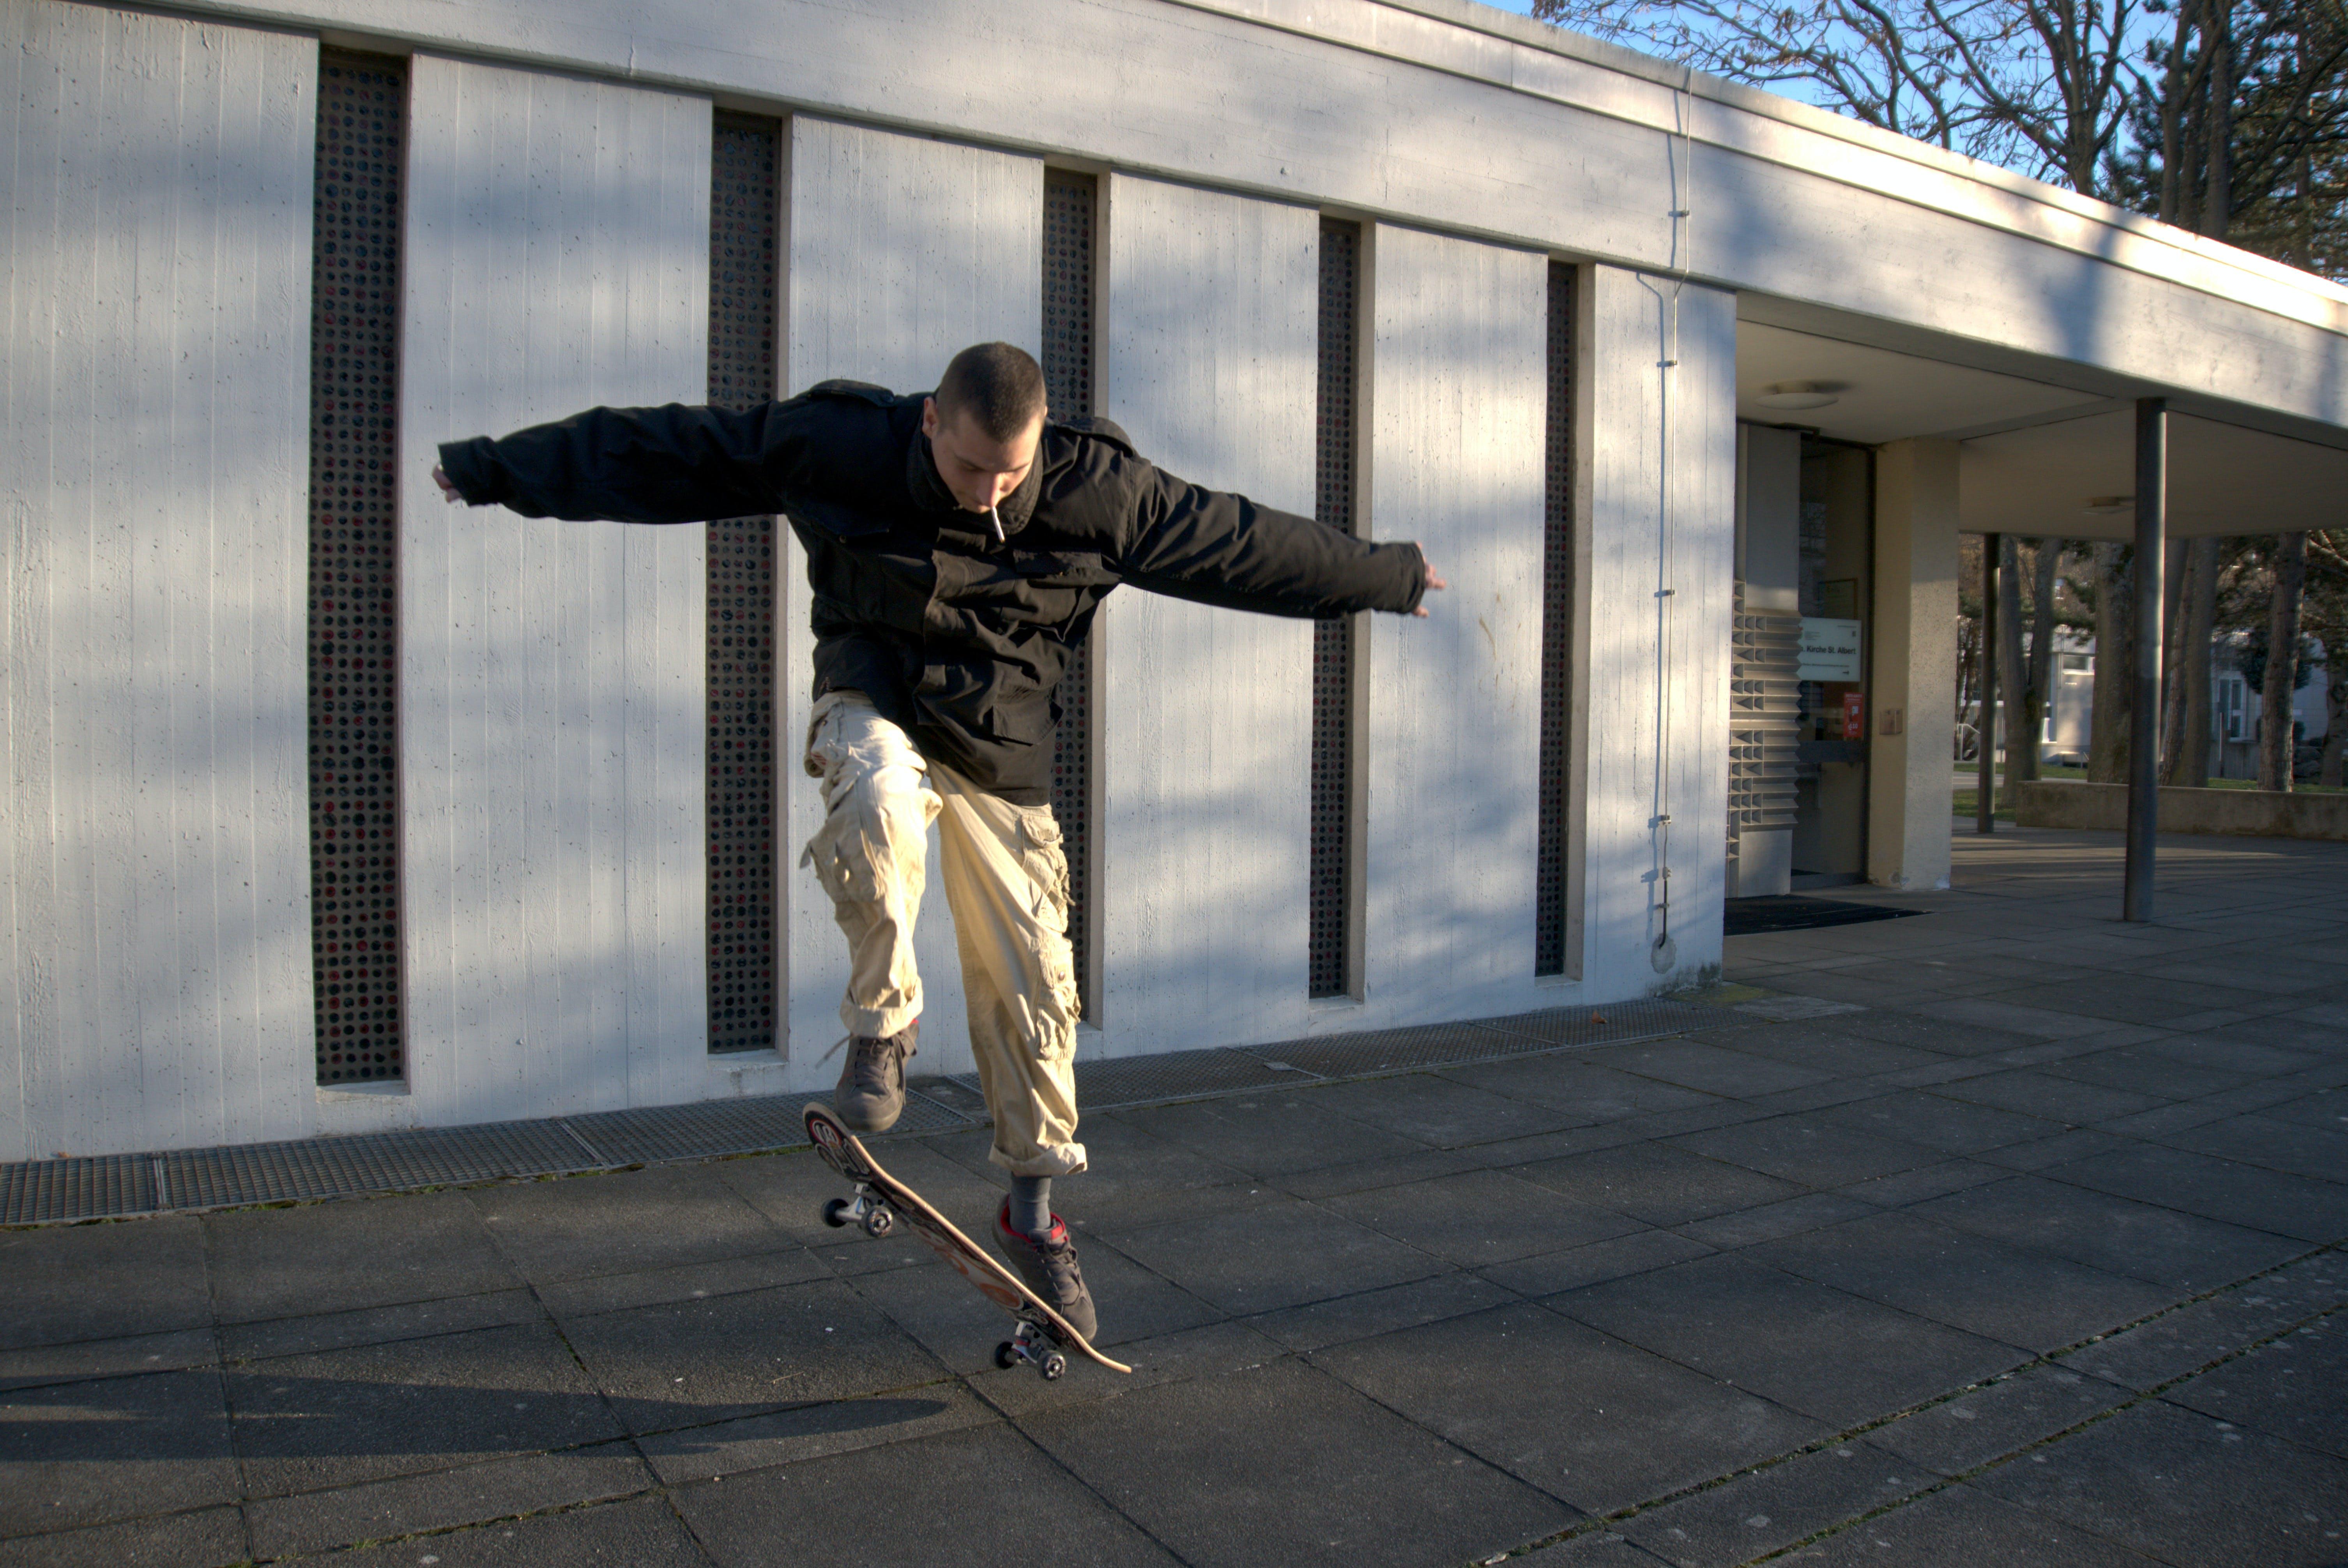 Free stock photo of skateboarder